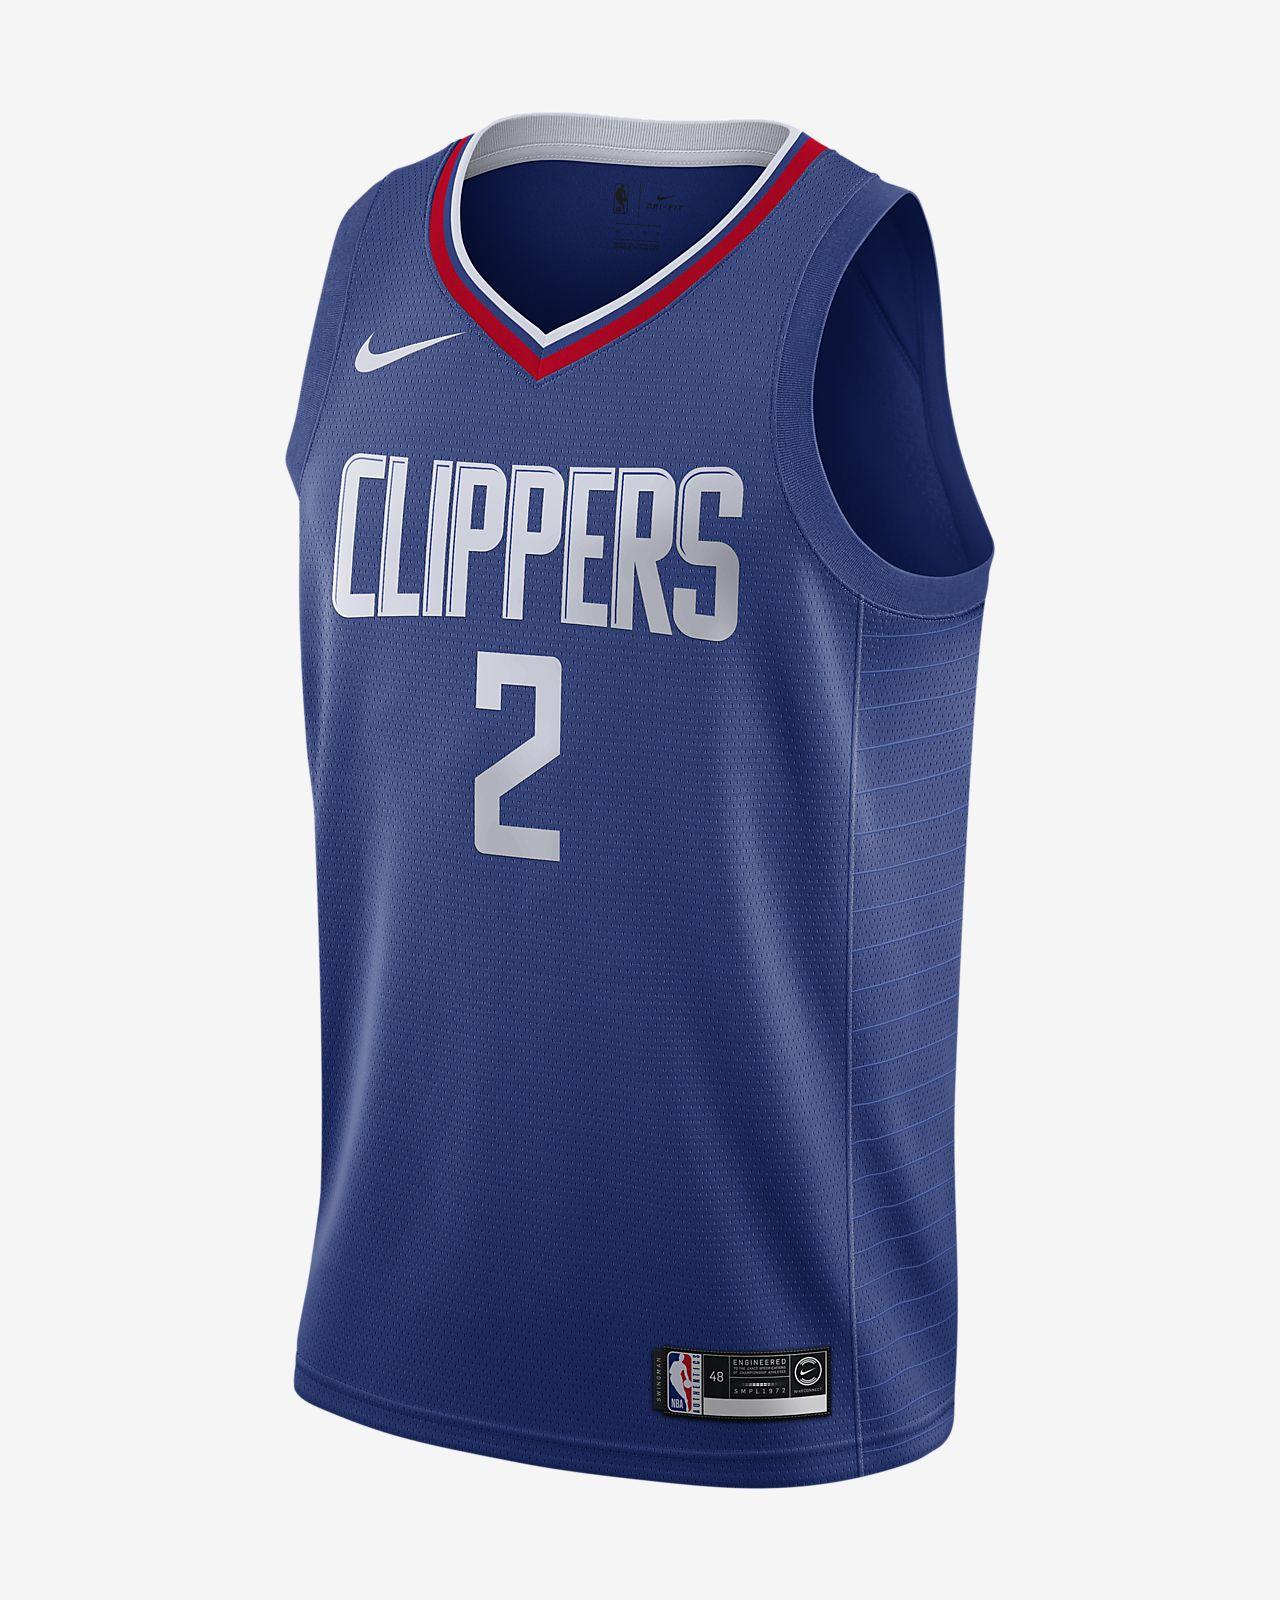 Maillot Nike NBA Swingman Kawhi Leonard Clippers Icon Edition